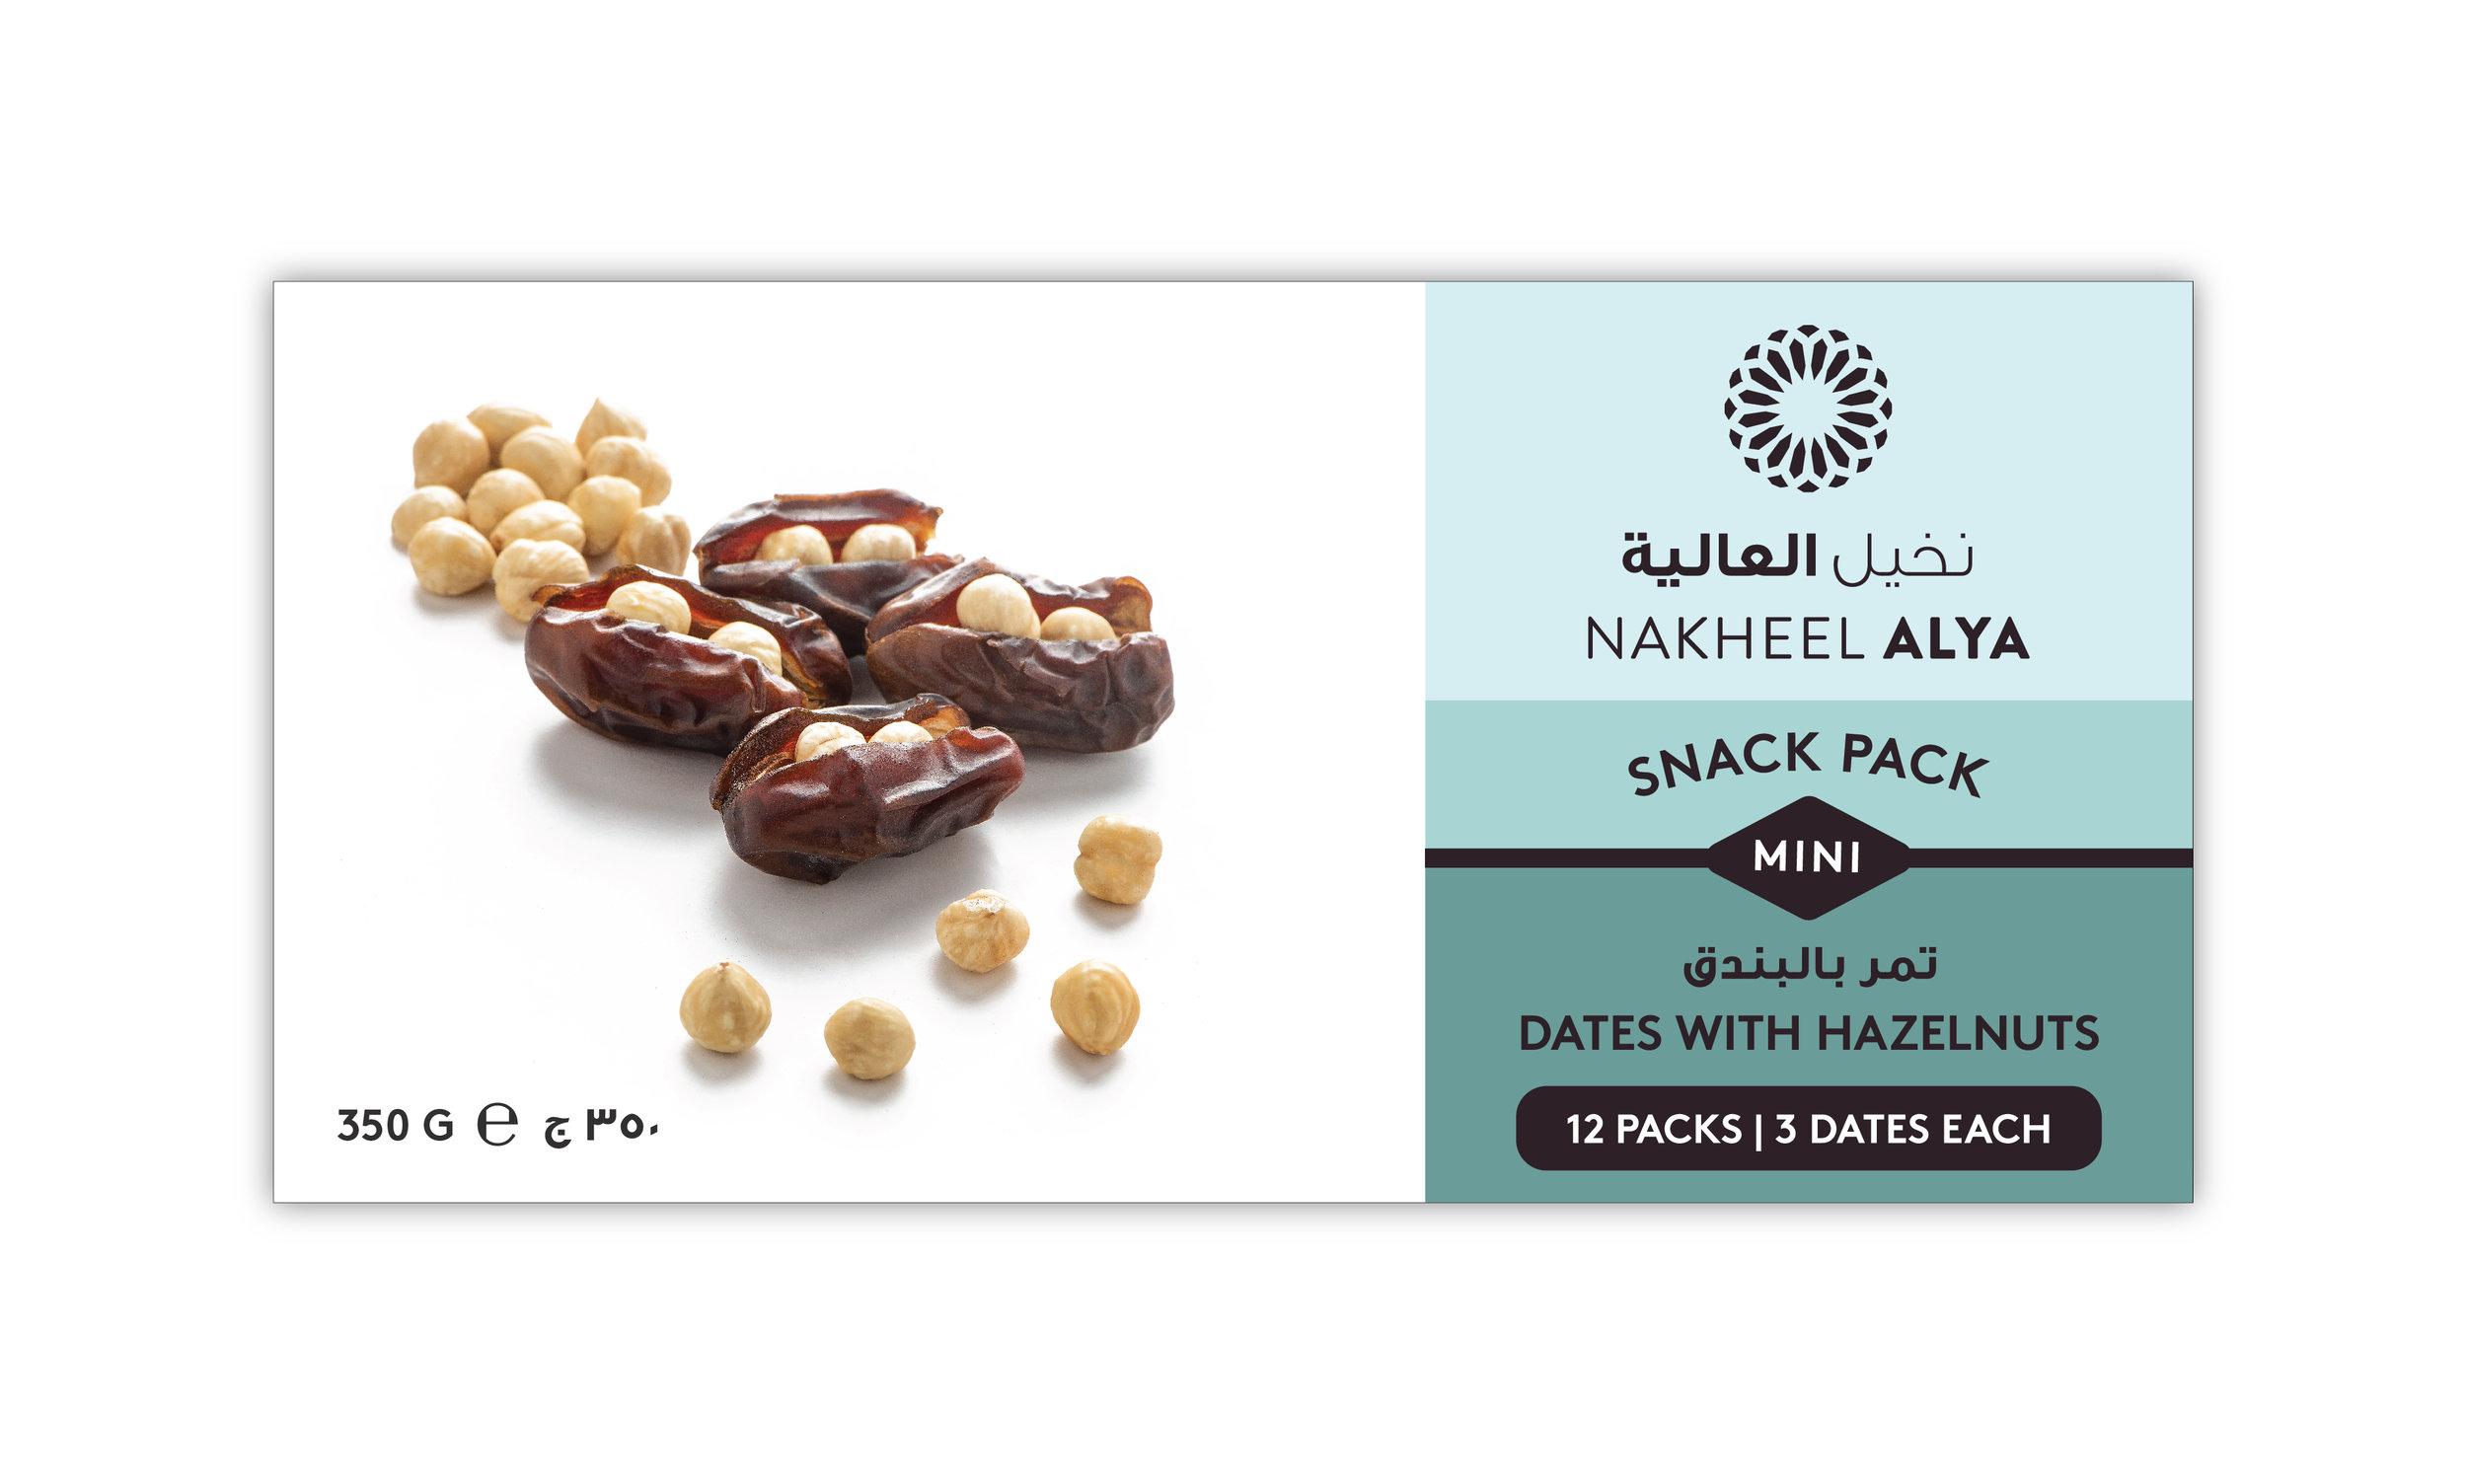 Snack Pack Mini Box_Dates with Hazelnut_WEB.jpg